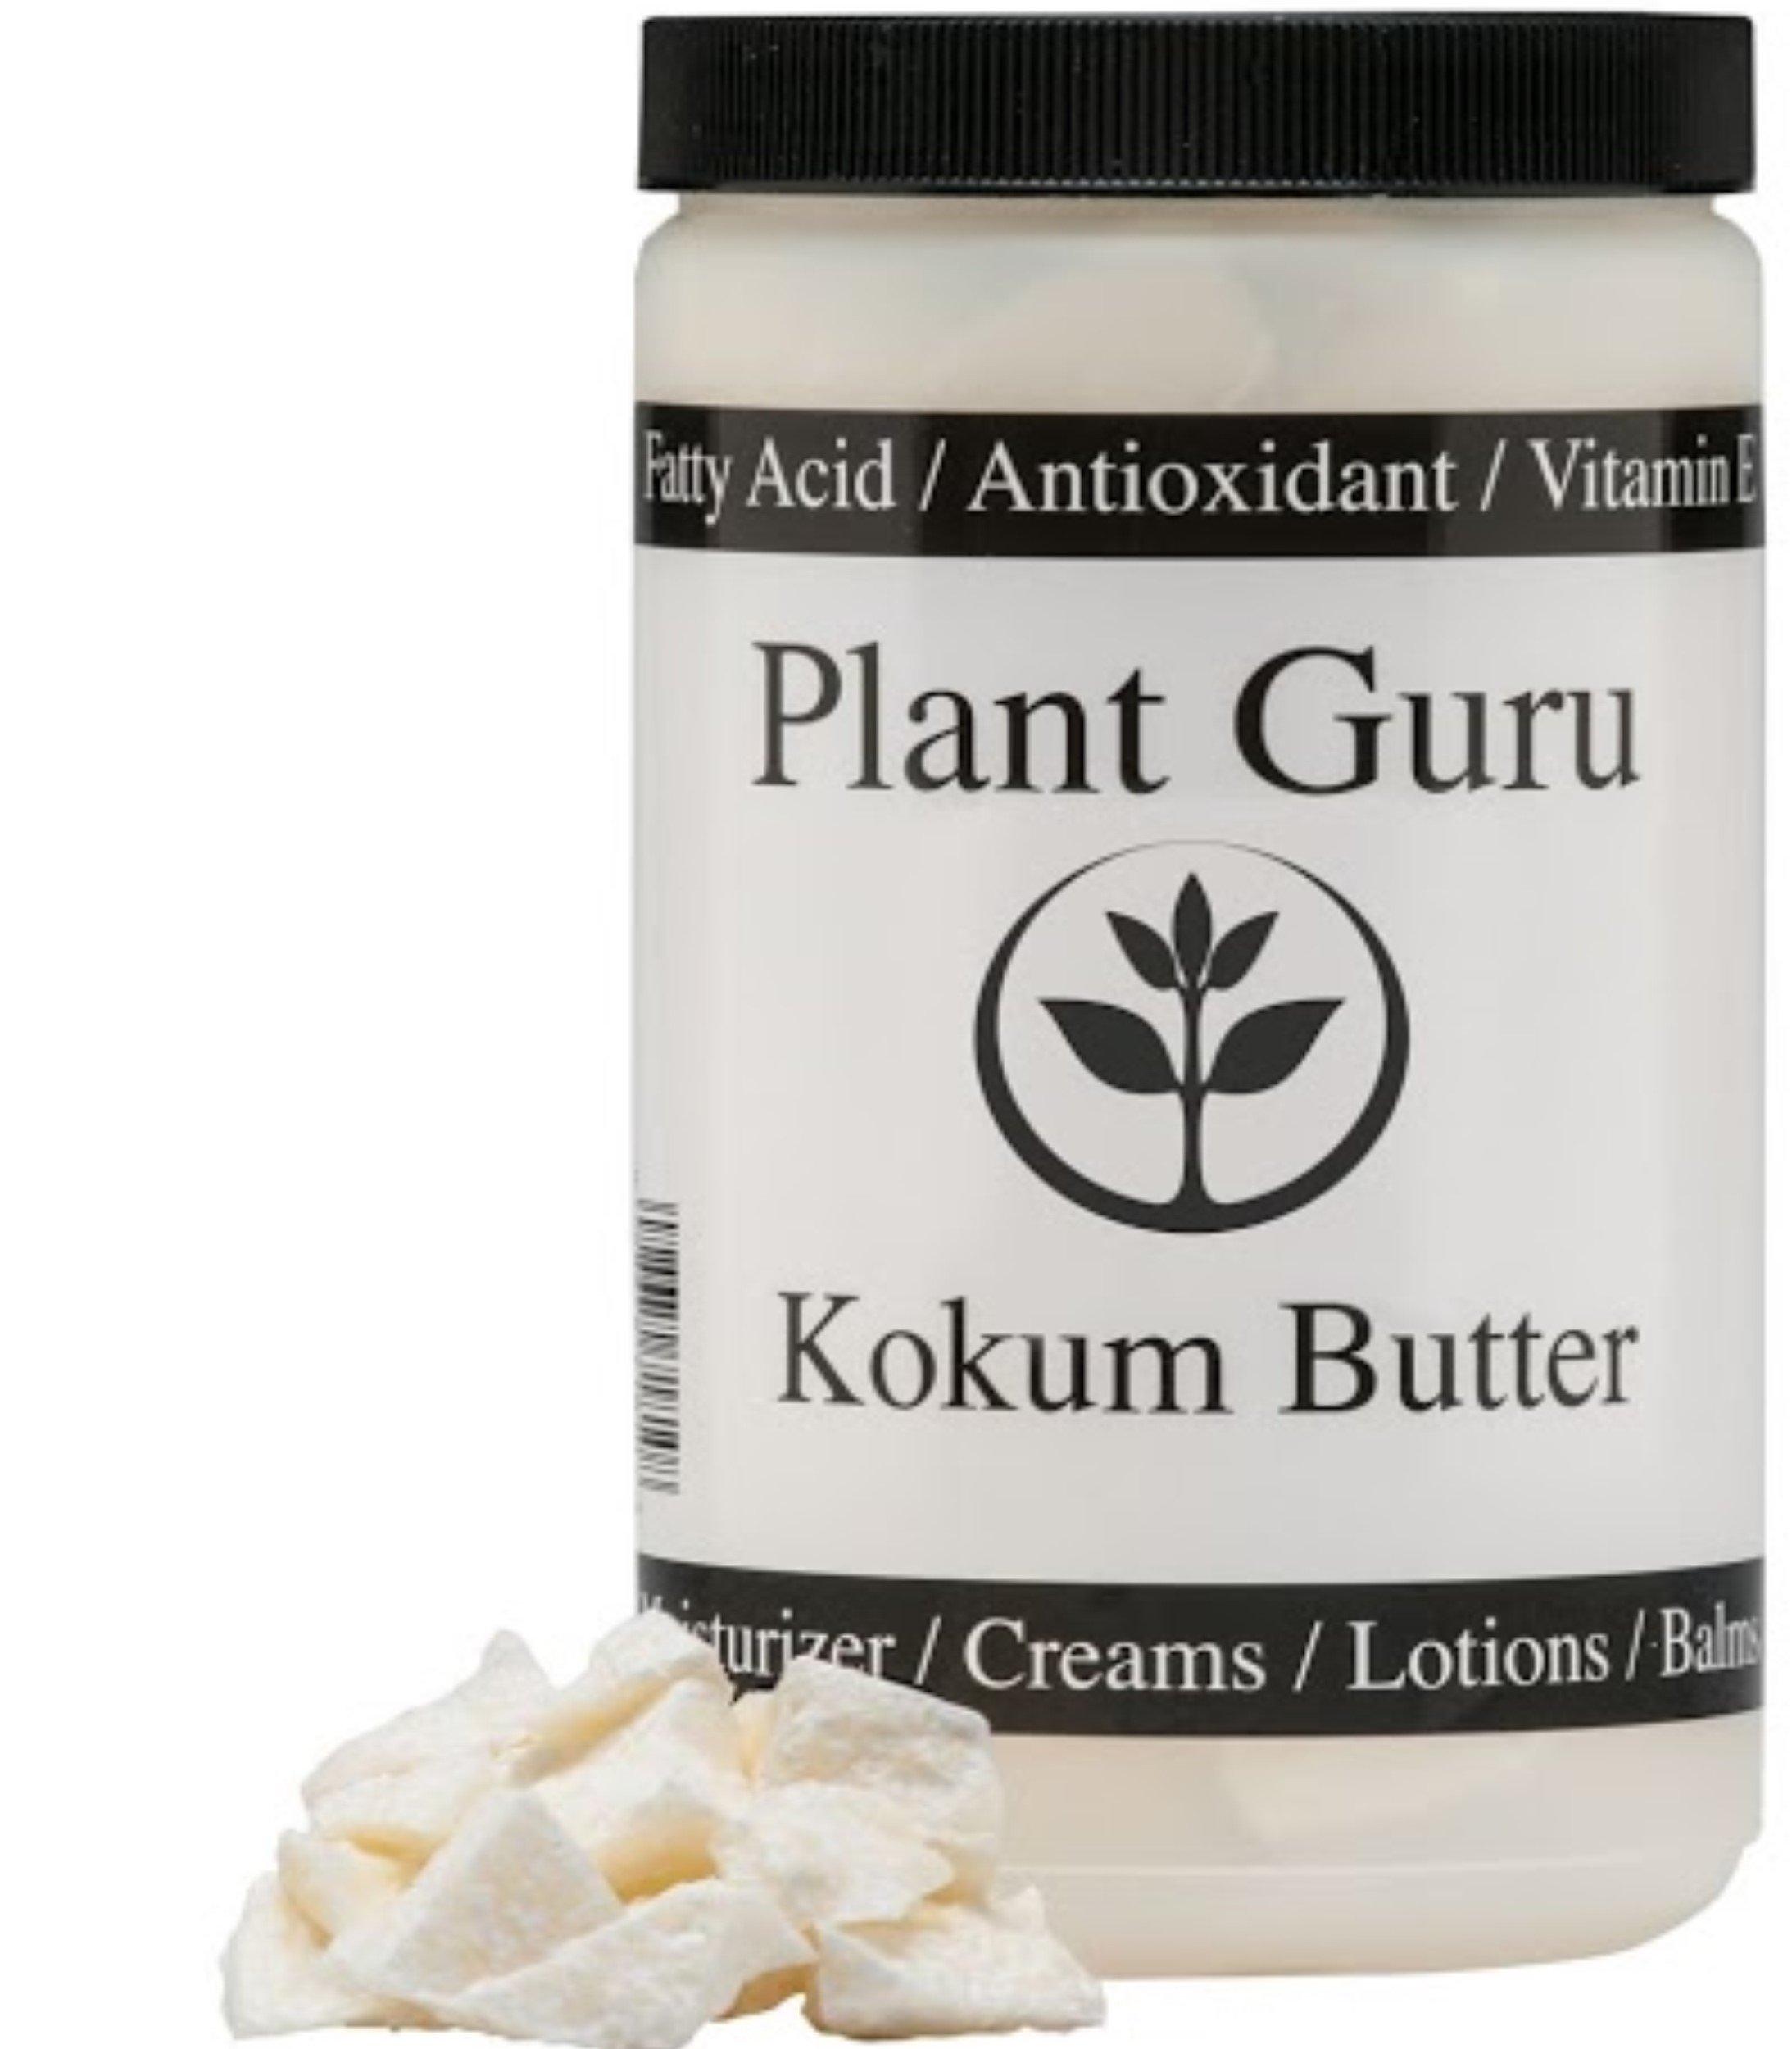 Raw Kokum Butter 16 oz / 1 lb. 100% Pure Natural Cold Pressed Great Skin, Hair, DIY Creams, Lotion, Lip Balm, Soap Making (HDPE Food Grade Jar)